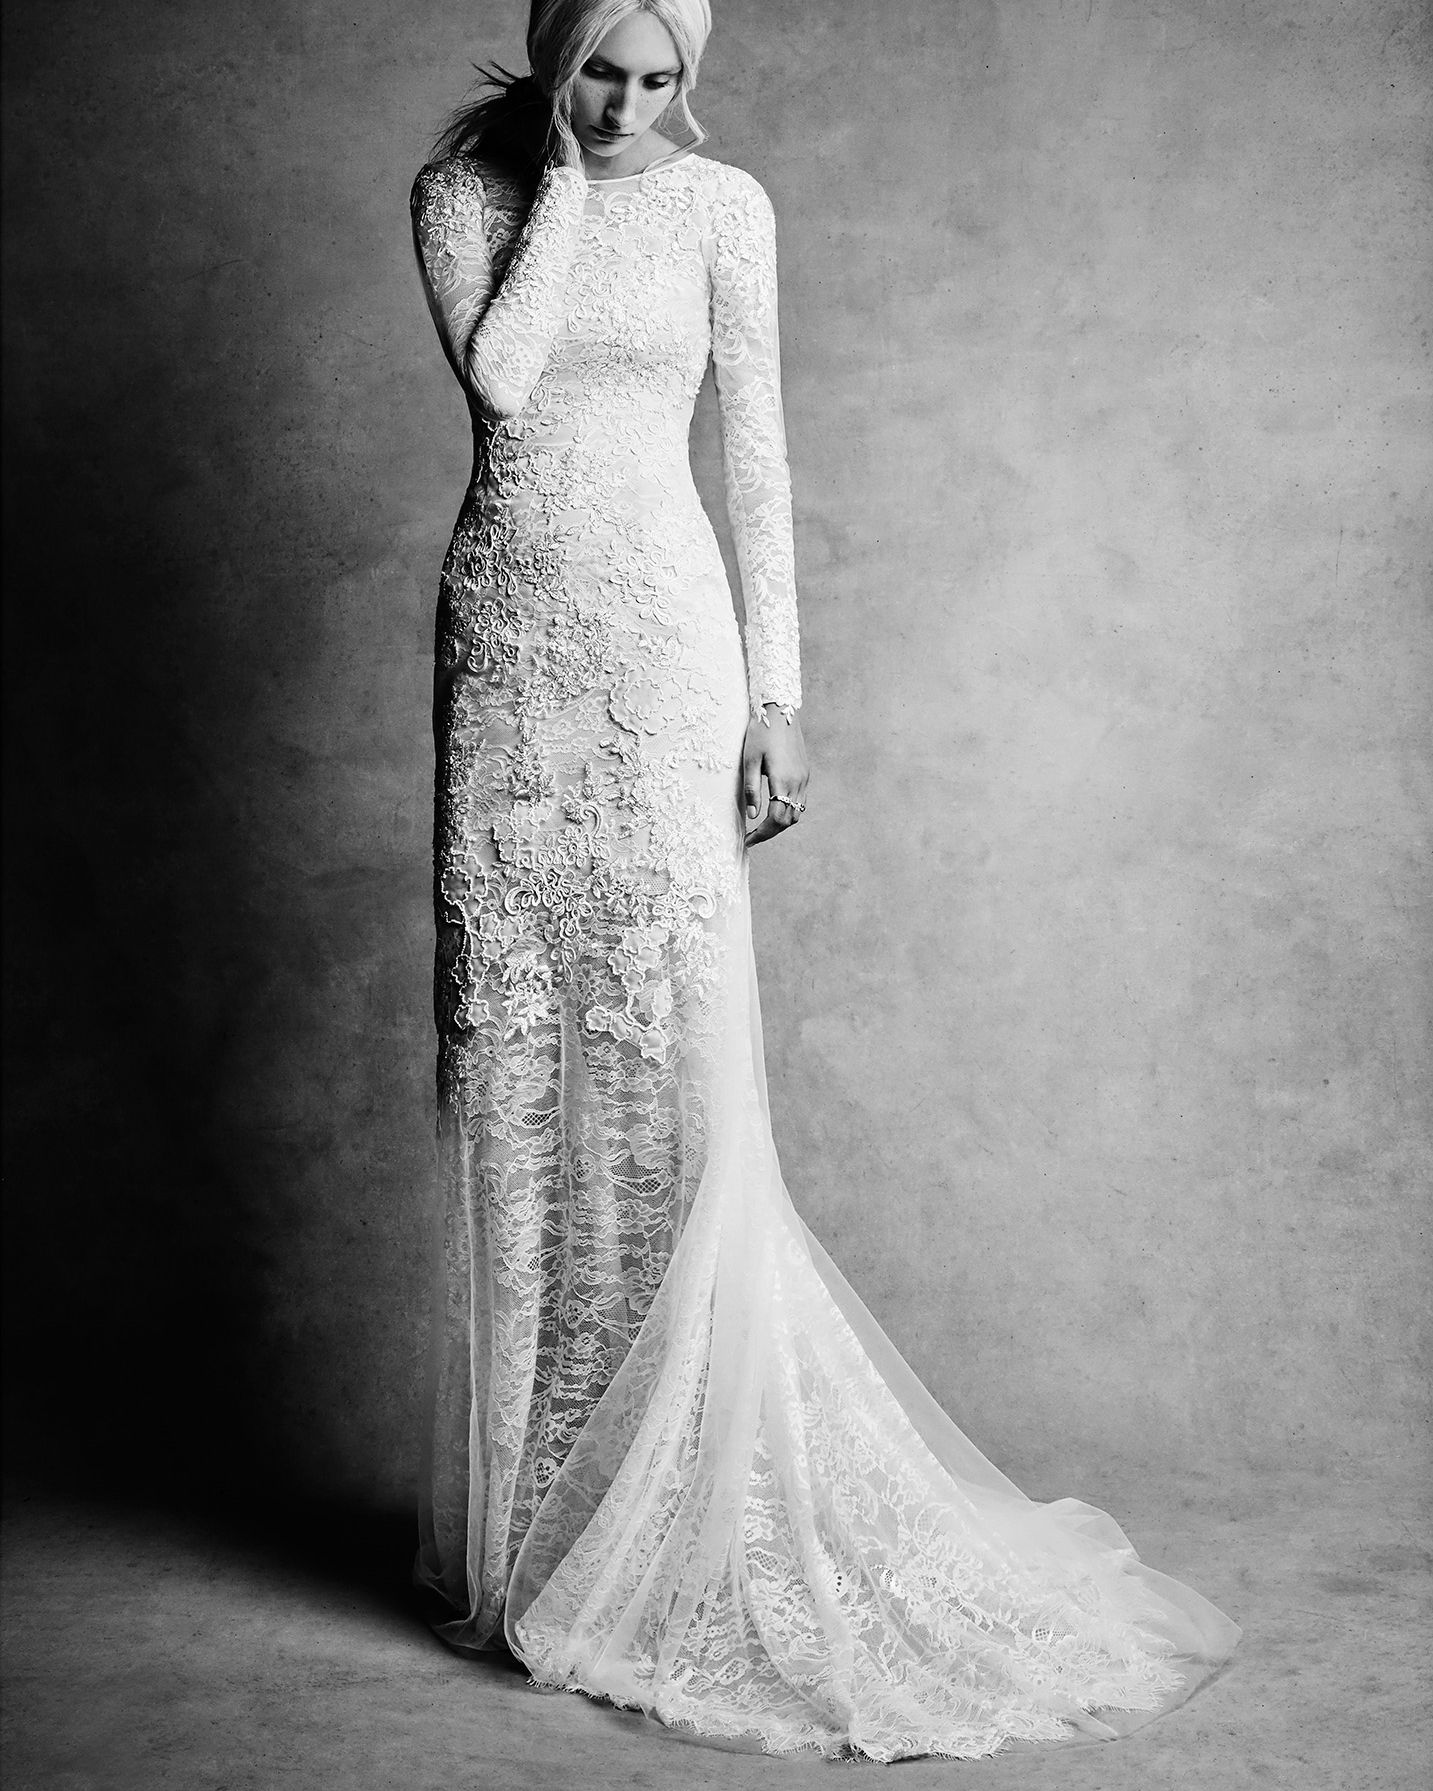 Pin On White X Vera Wang Wedding Dresses And Bridesmaids [ 1791 x 1433 Pixel ]